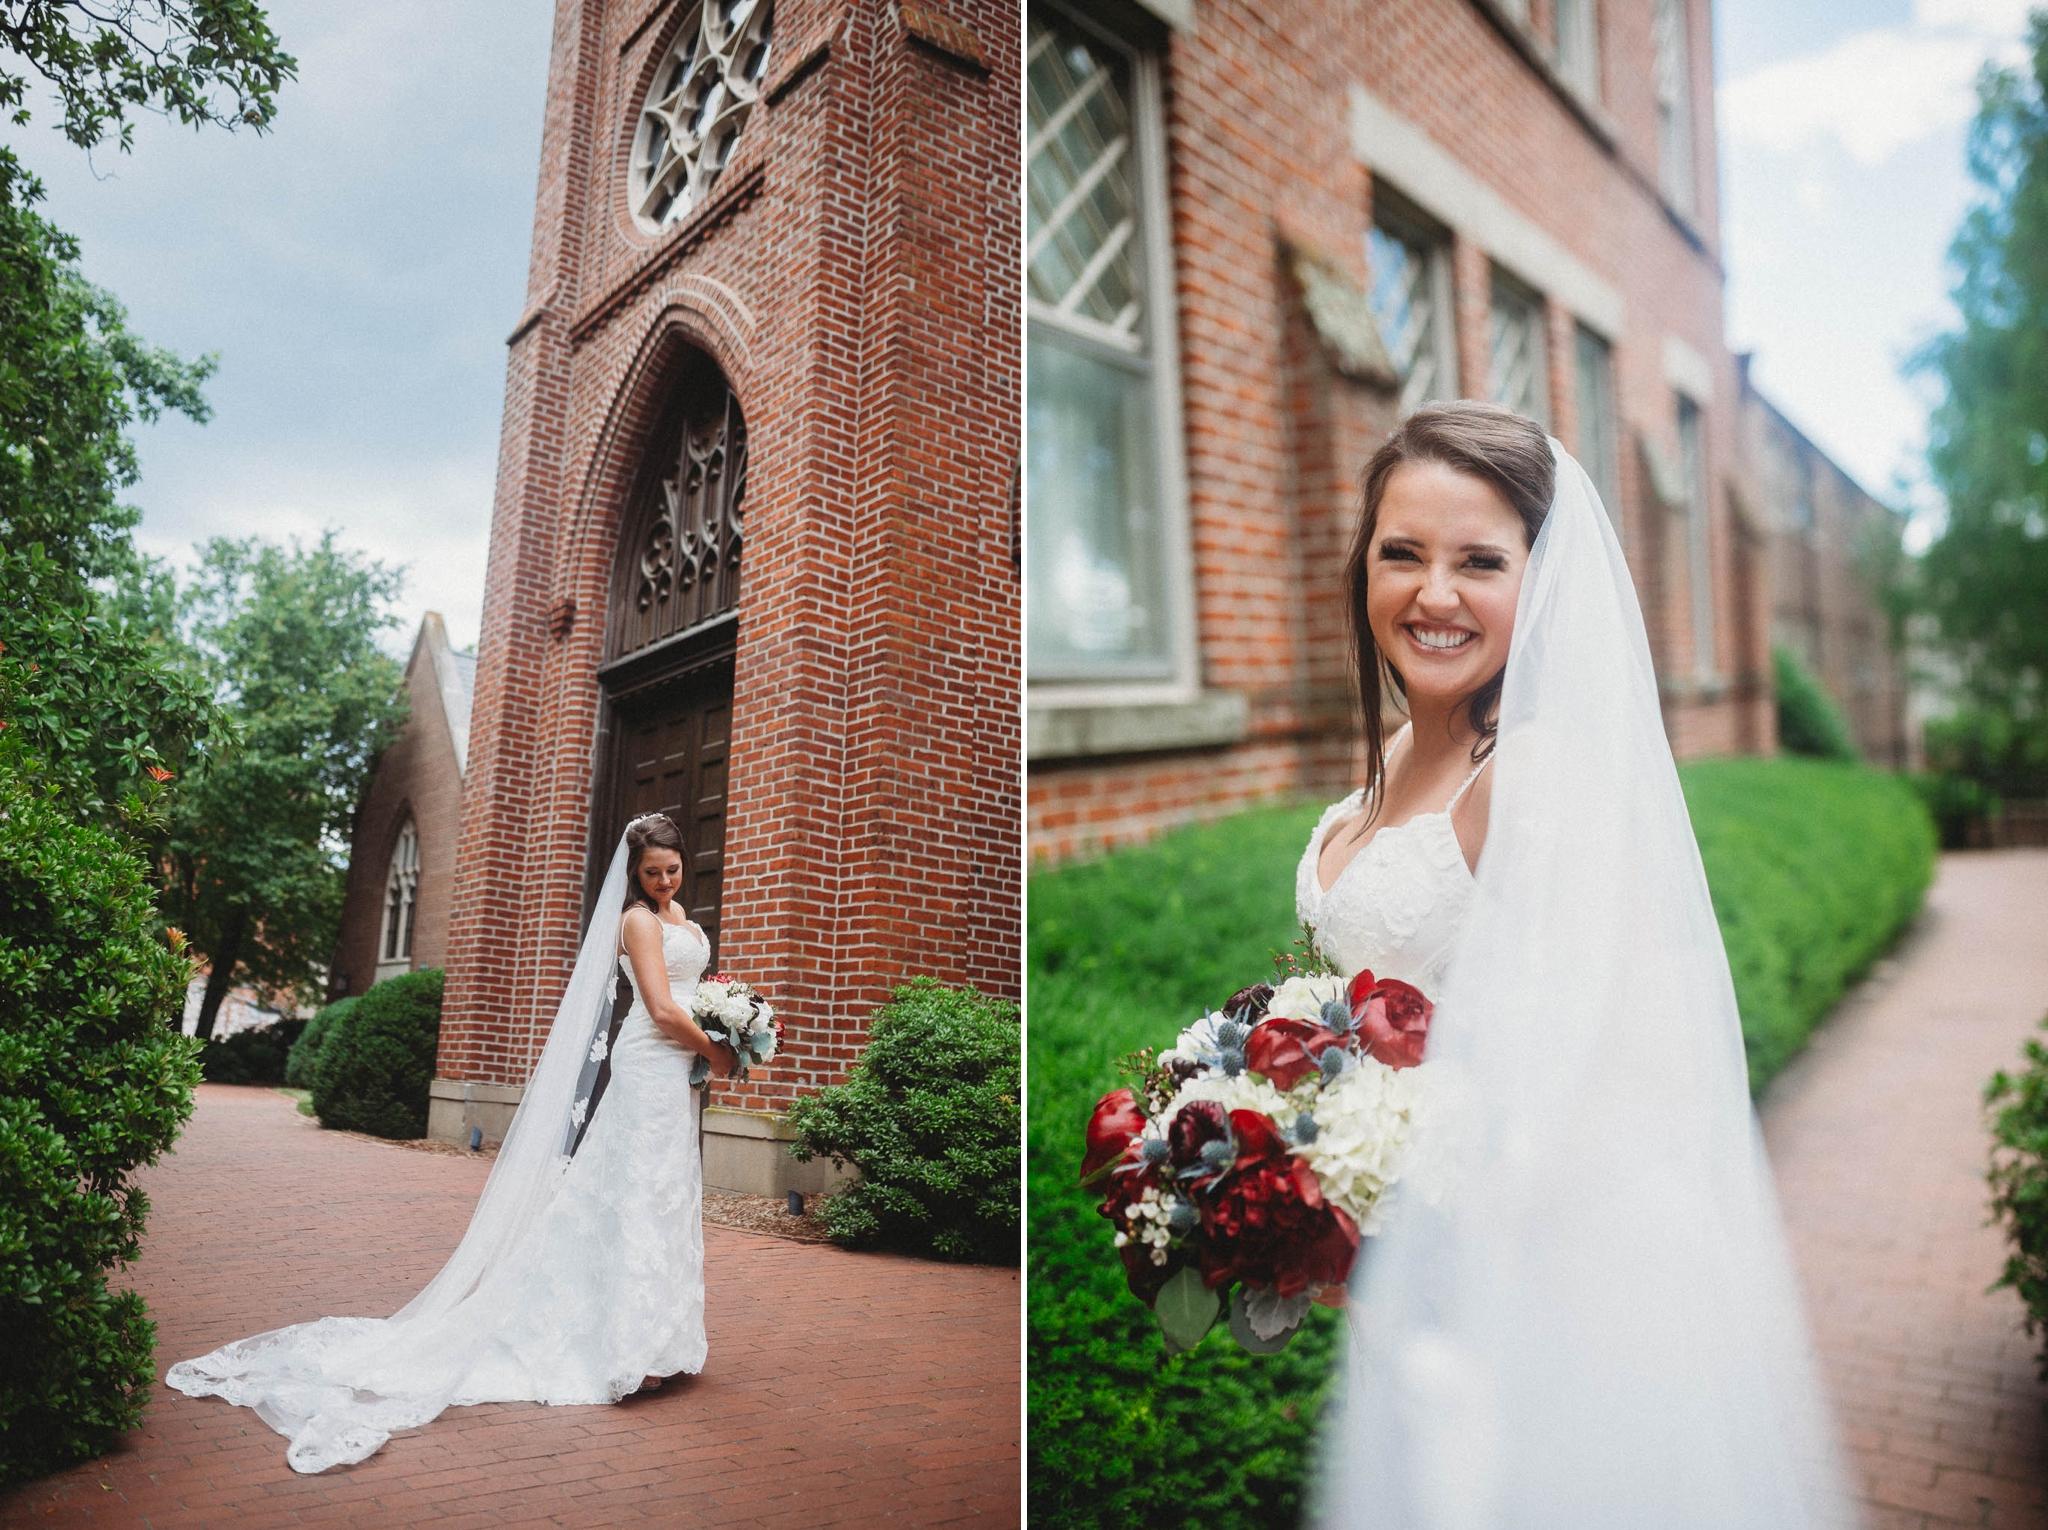 Portraits of the Bride Megan + Jon - Run away Elopement at the Blue Ridge Park Way in Asheville, North Carolina